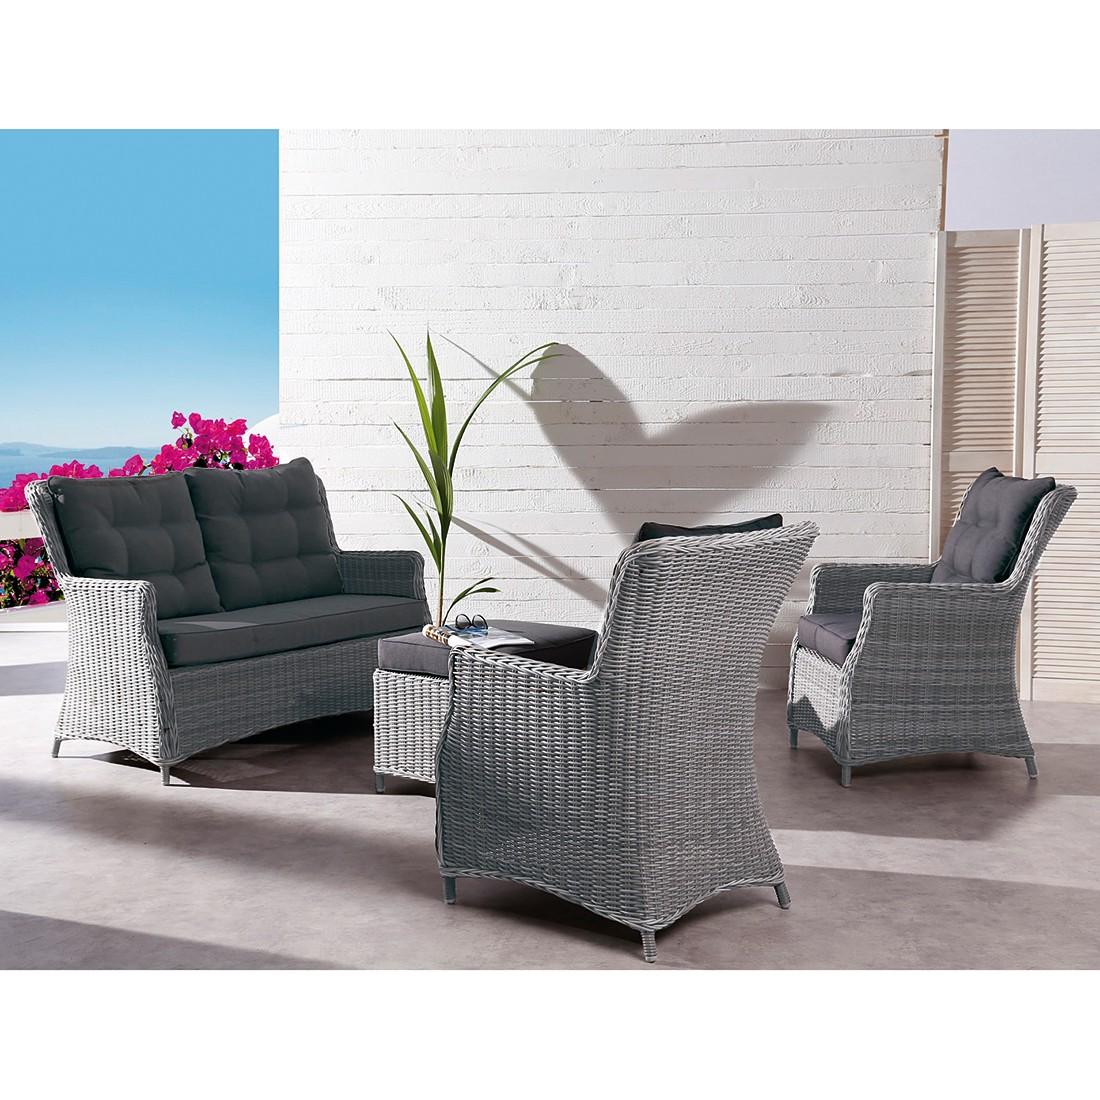 gartensofa barcelona i polyrattan grau best. Black Bedroom Furniture Sets. Home Design Ideas